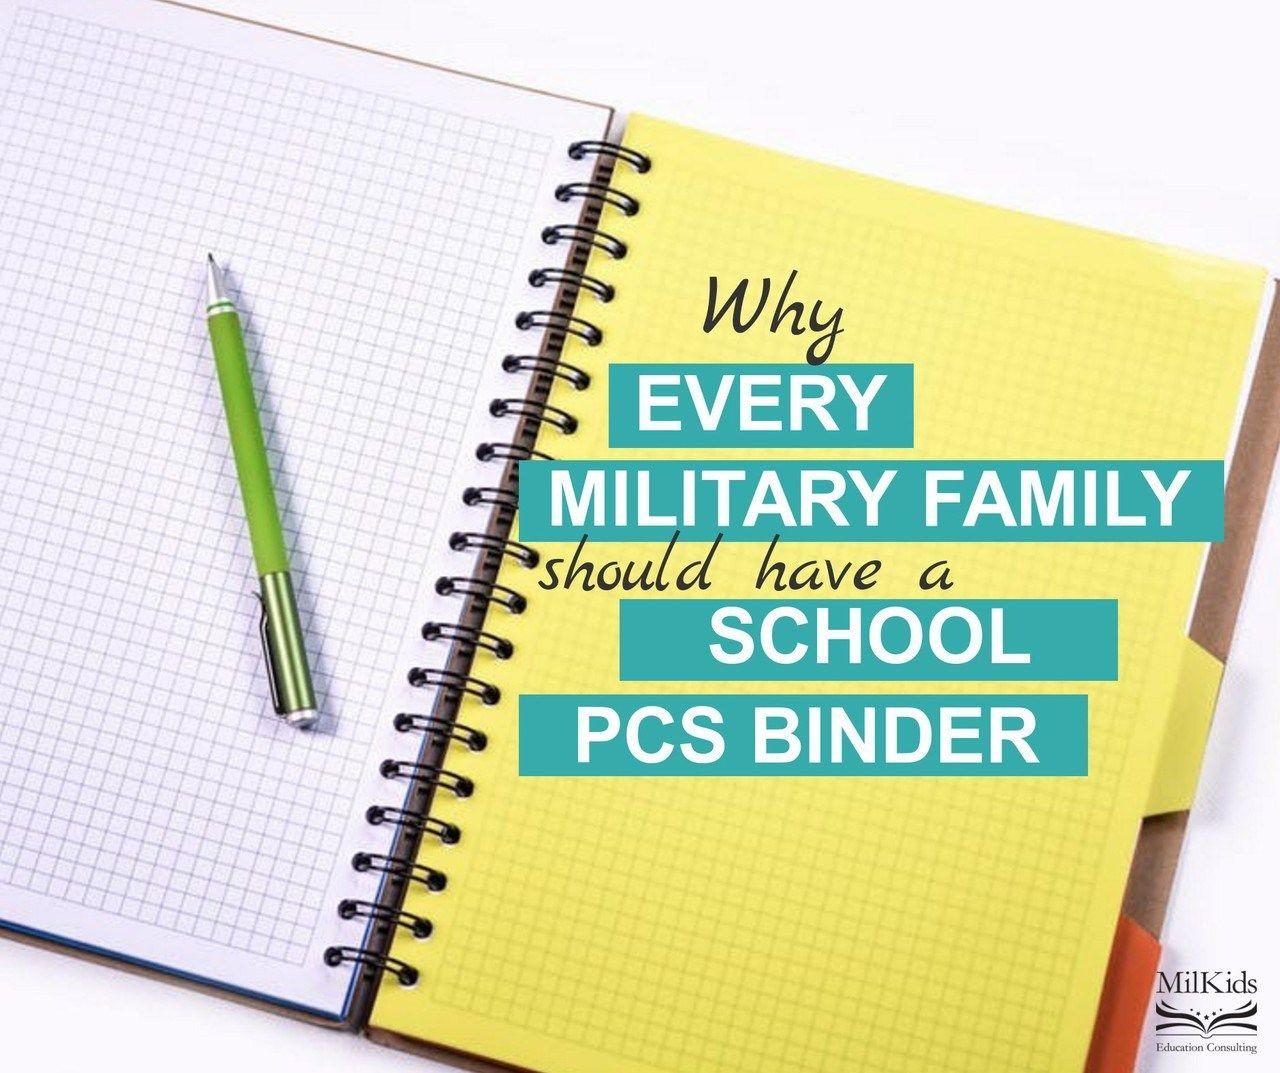 Every MilFam Should Have A School PCS Binder